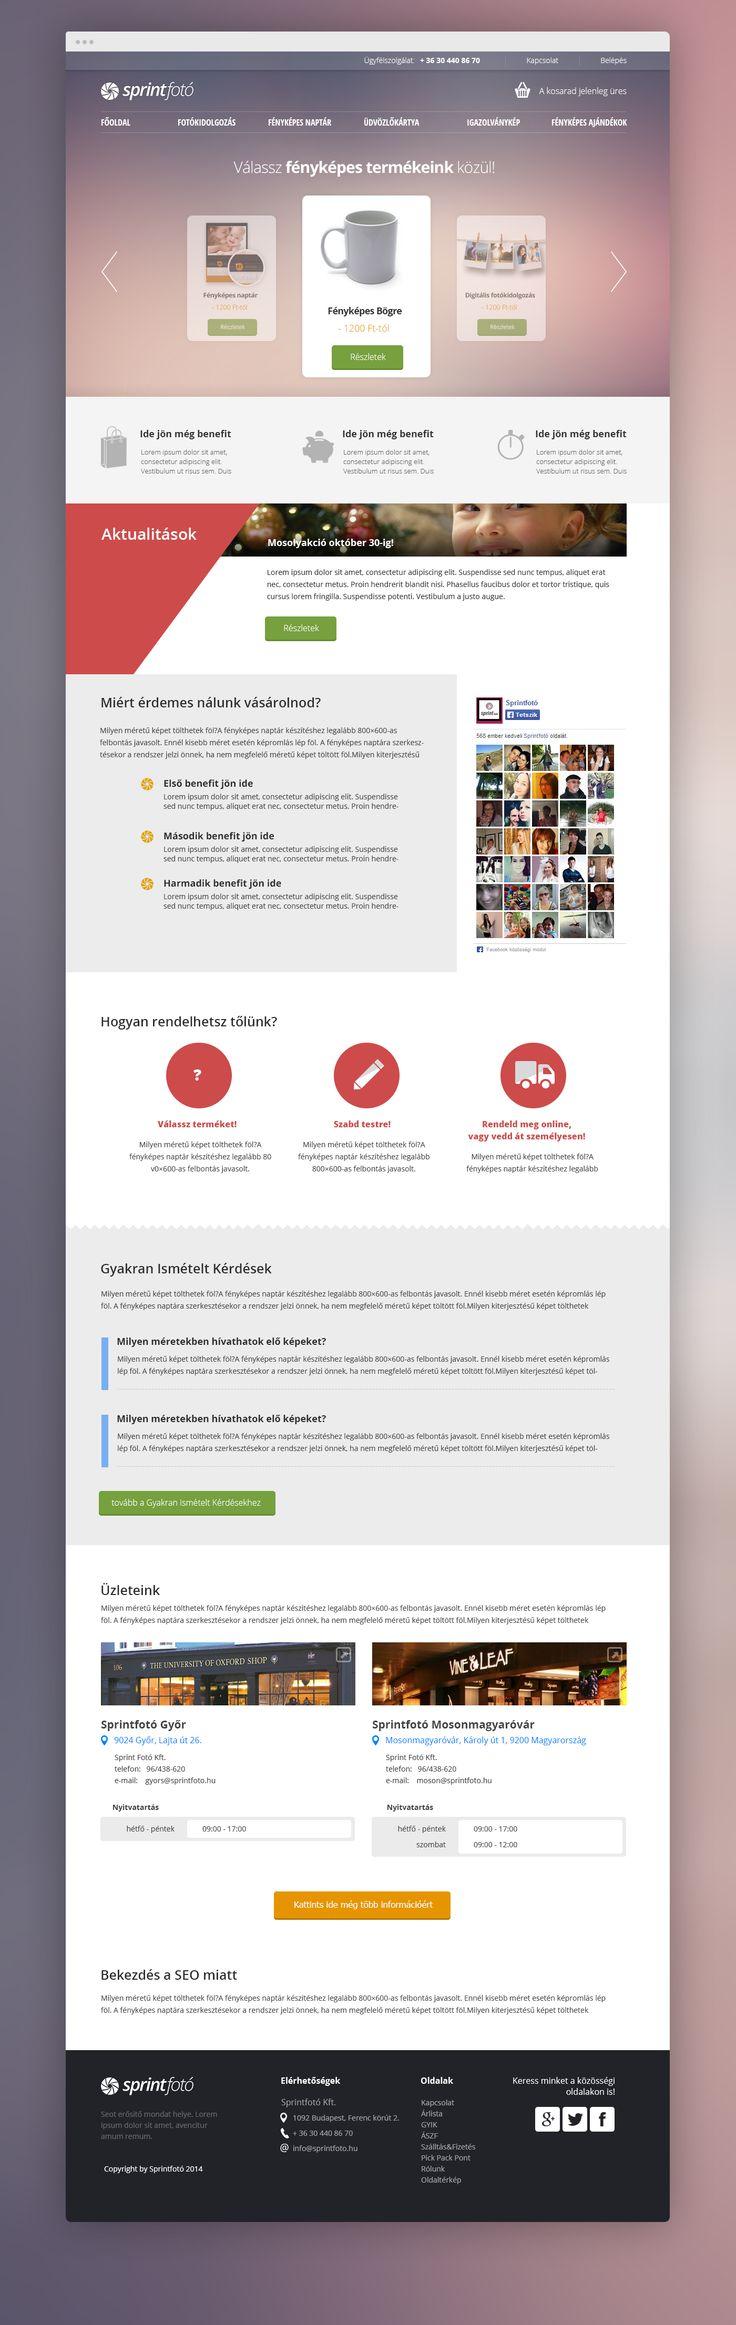 Main page design - online photo printing company. Sprintfoto project.